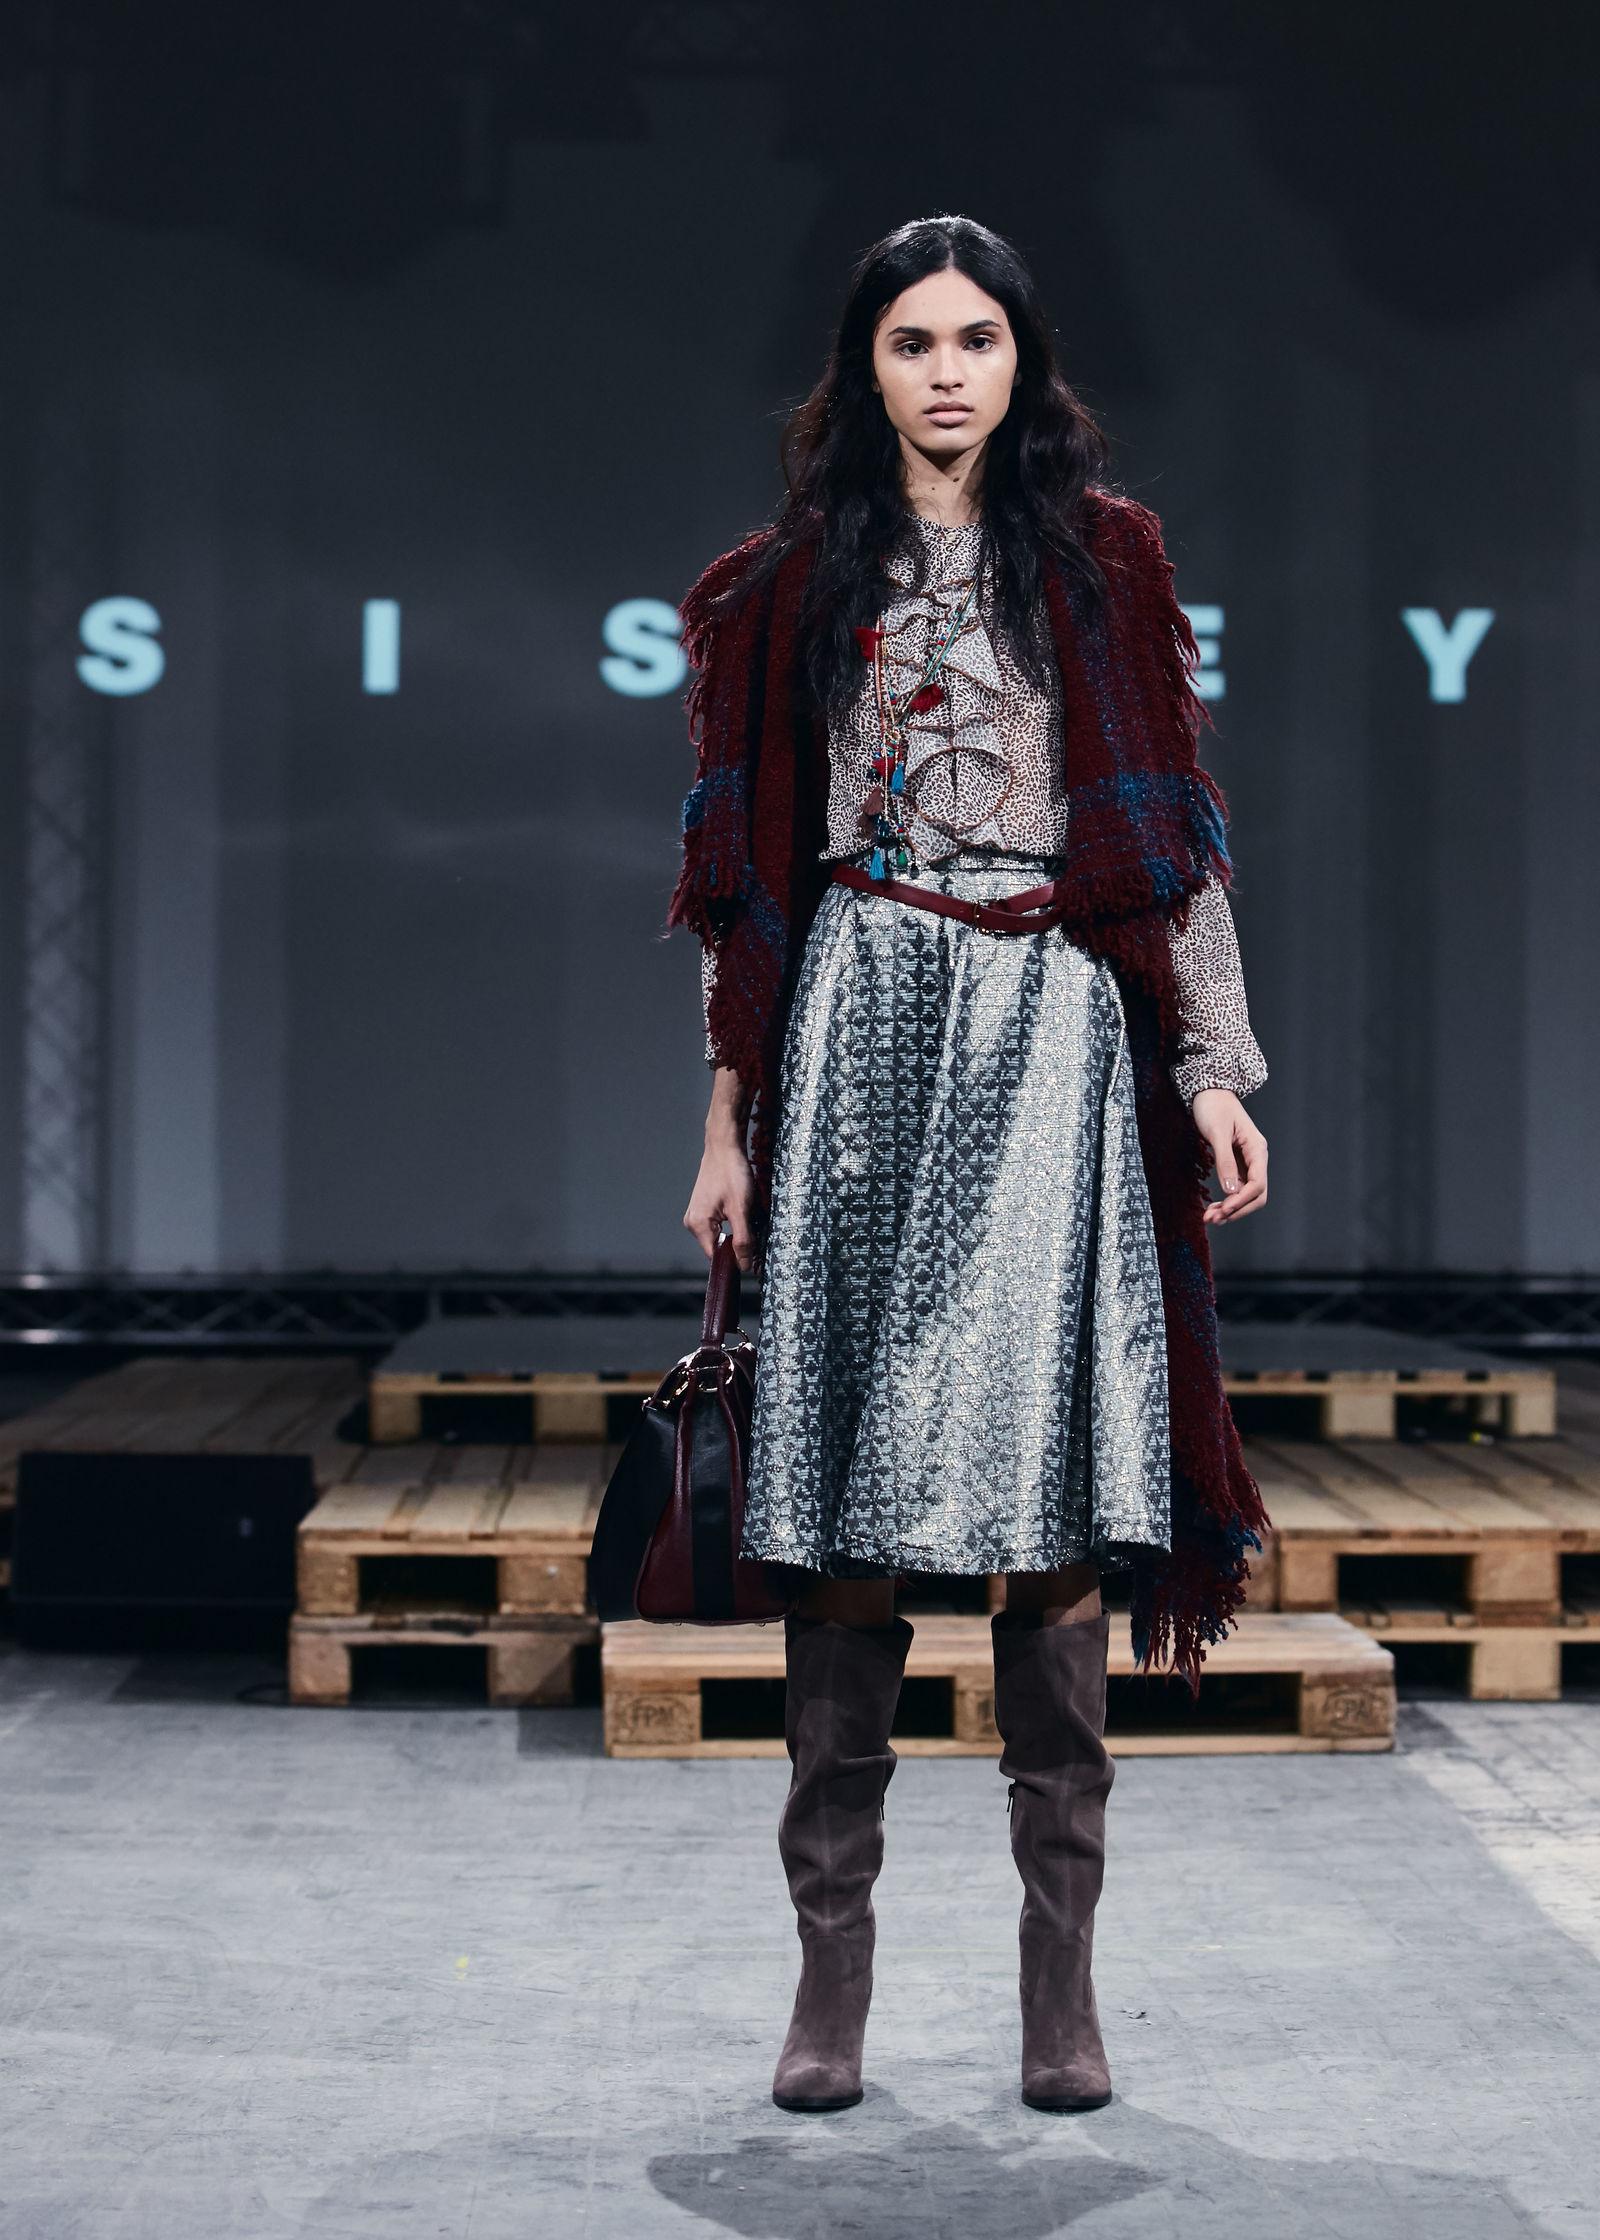 SISLEY (Bild 7)